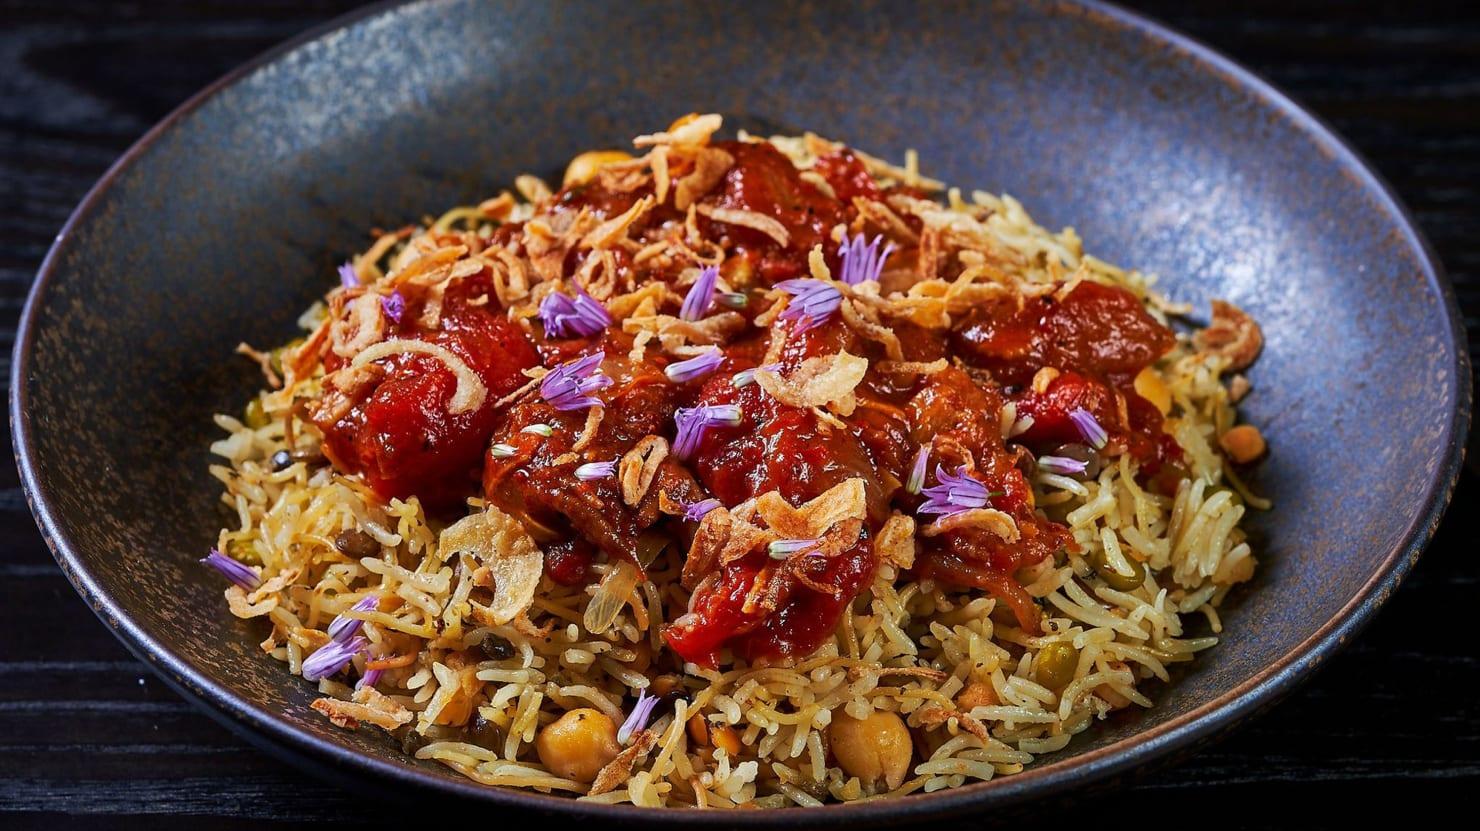 Our Favorite Winter Dish Is Michael Mina's Egyptian Koshary